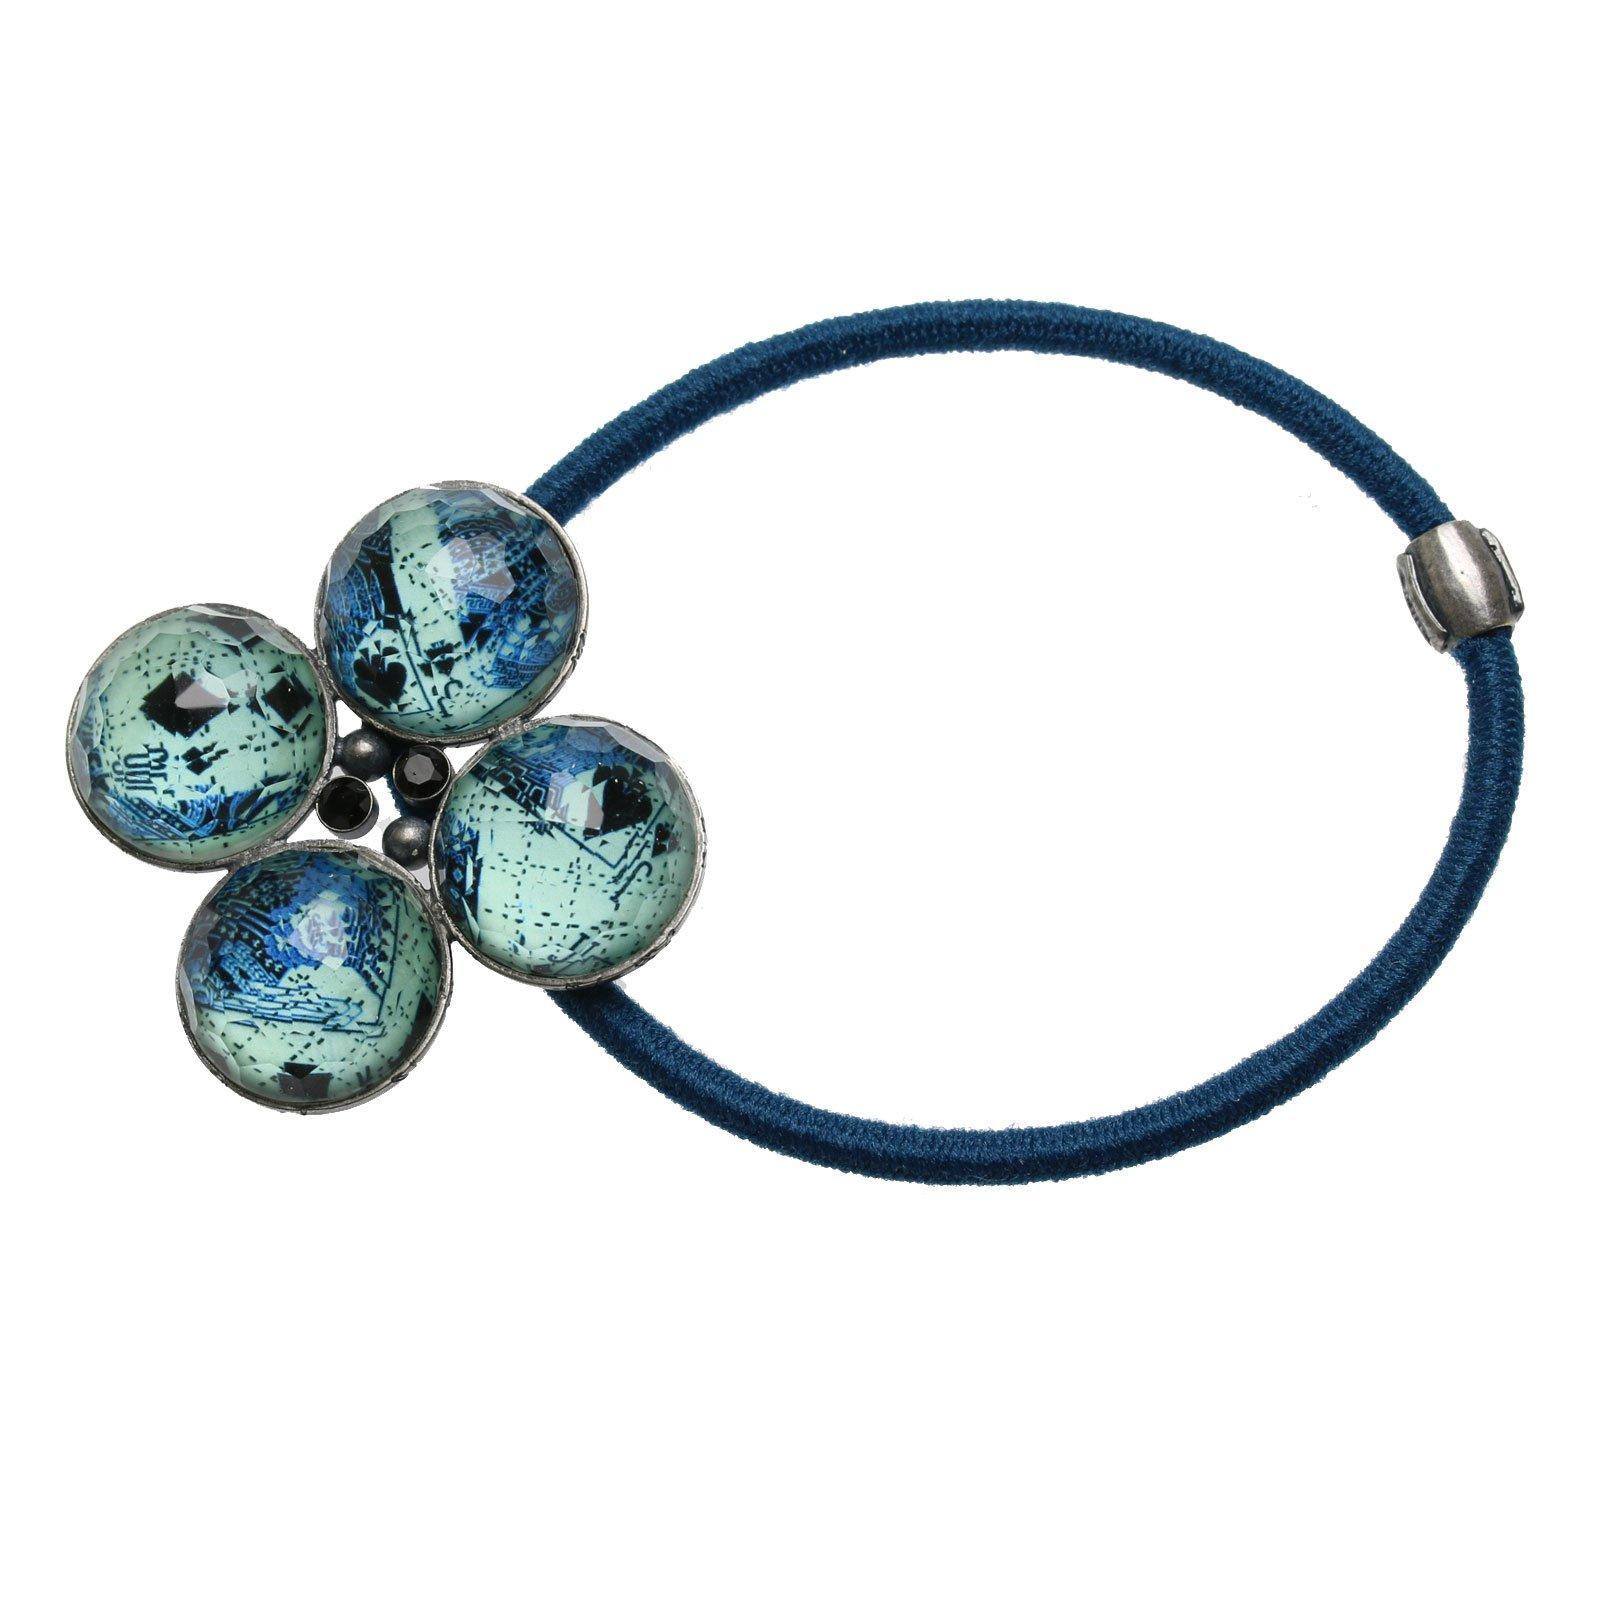 Tamarusan Ponytail Holder Cardigan Blue Four Round Hair Rubber Hair Ornament Blue Handmade